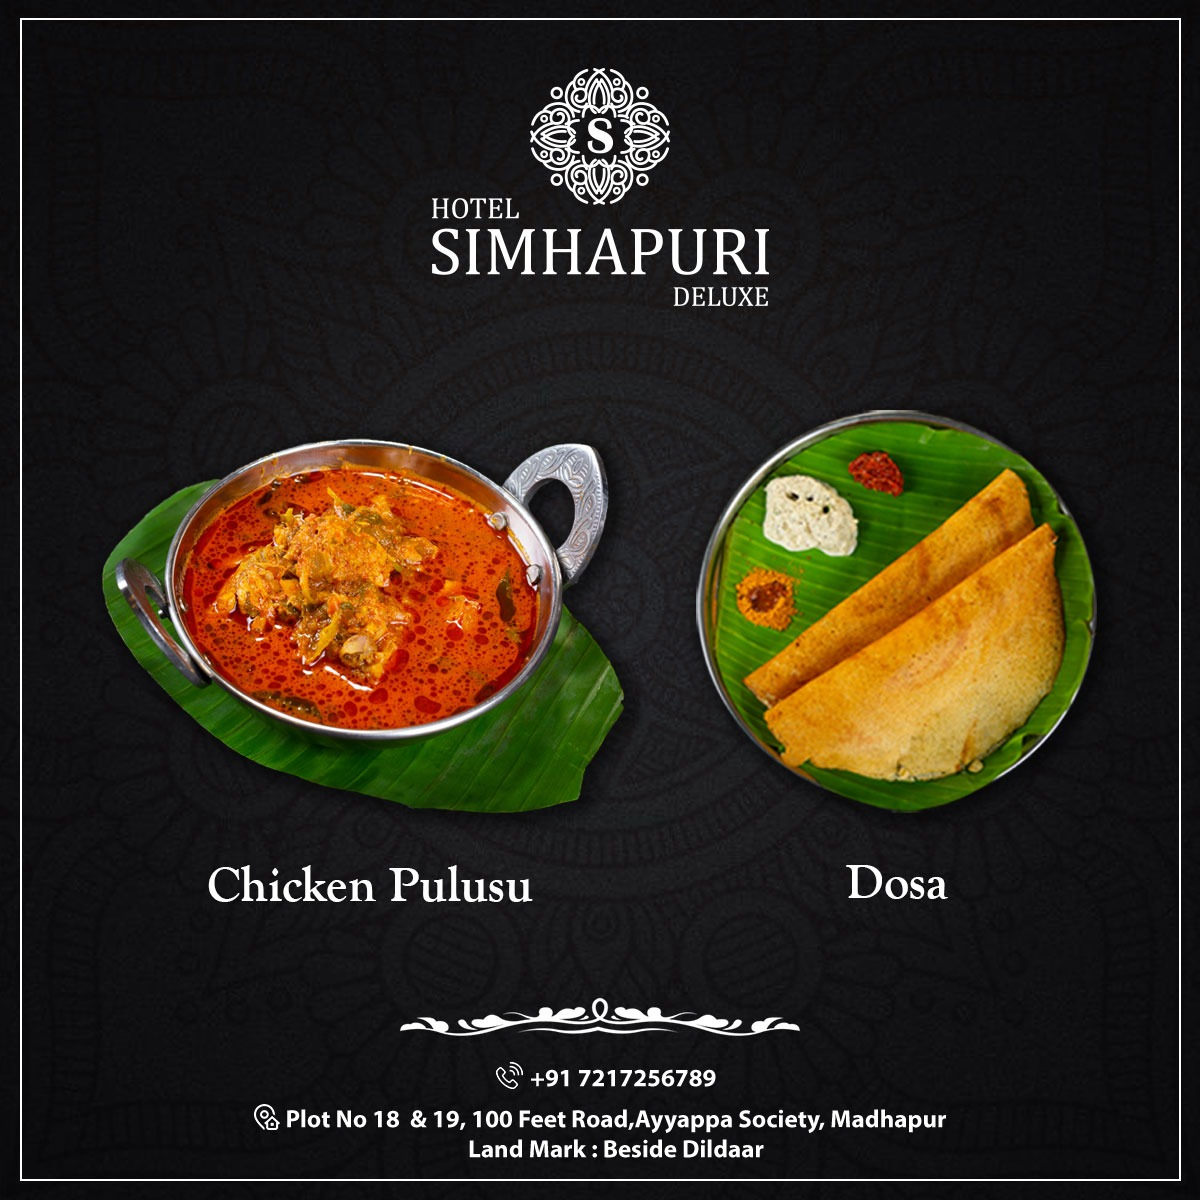 This Telugu food combination makes you feel like home!  Address: Plot No 18 & 19, 100 Feet Road, Ayyappa Society, Madhapur, Beside Dildaar. 📞 7217256789 #yummy #food #delicious #dosa #chickenpulusu #southindian #indianfood #foodlover #simhapuri #hotelsimhapurideluxe #Hyderabad